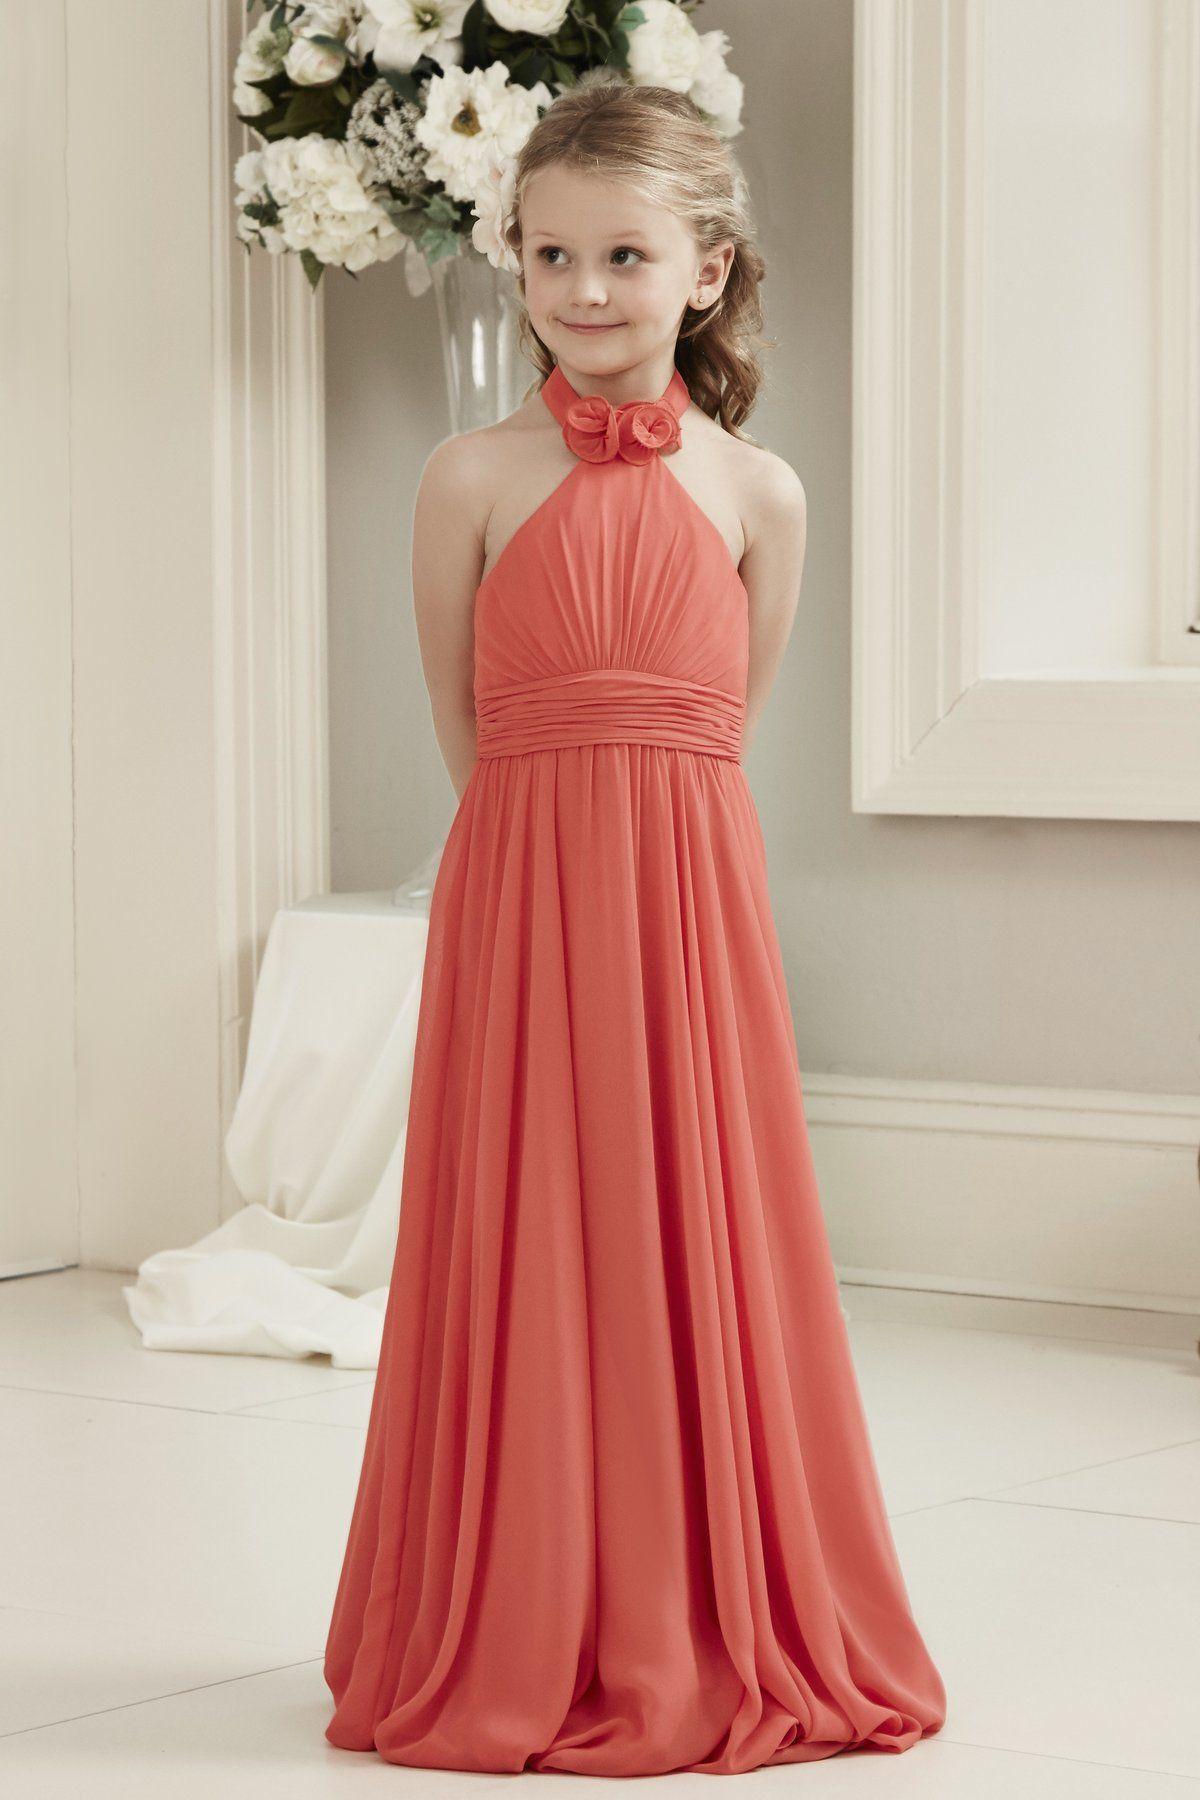 Alexia designs style chiffon long dress with high neckline